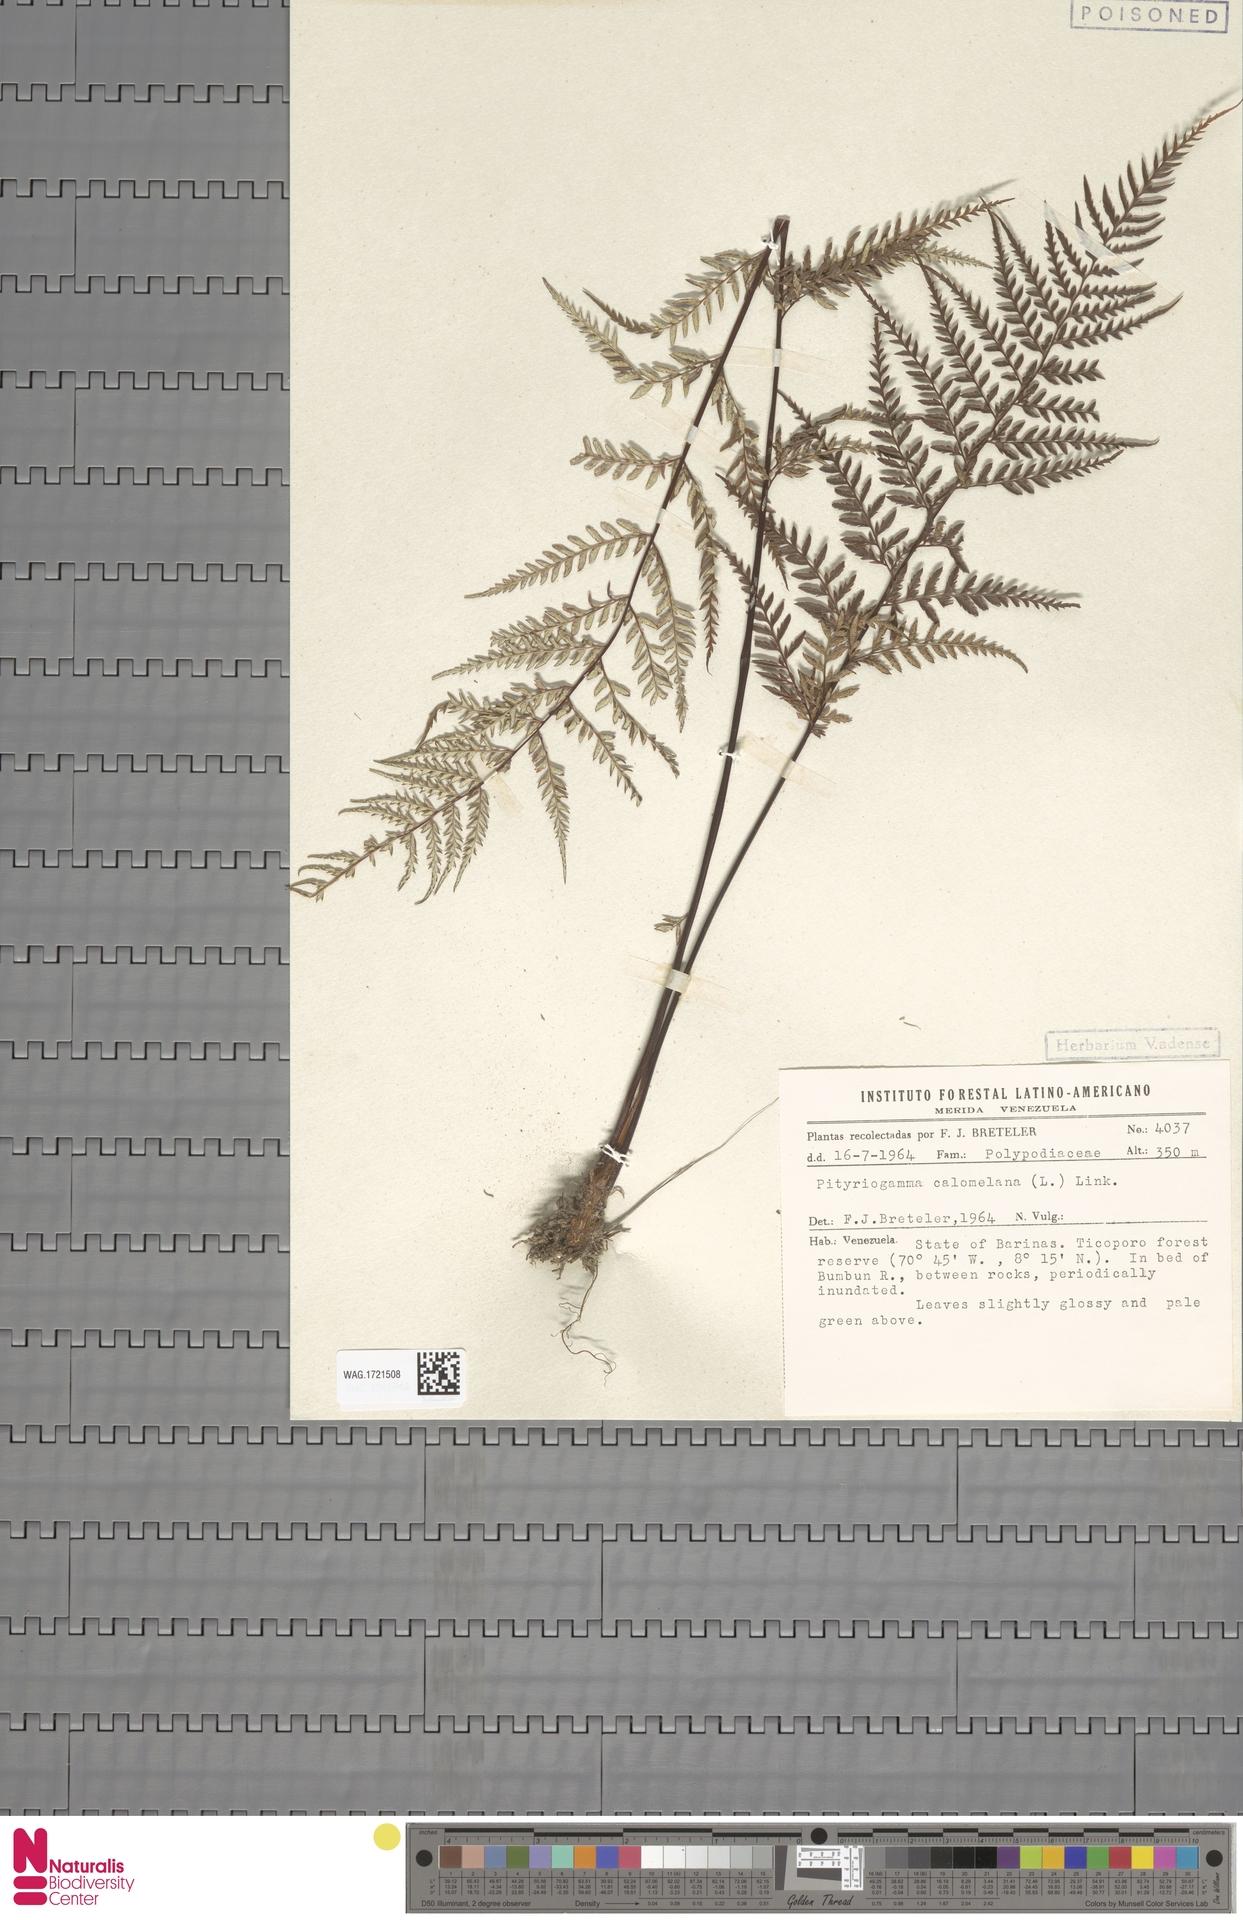 WAG.1721508   Pityrogramma calomelanos (L.) Link